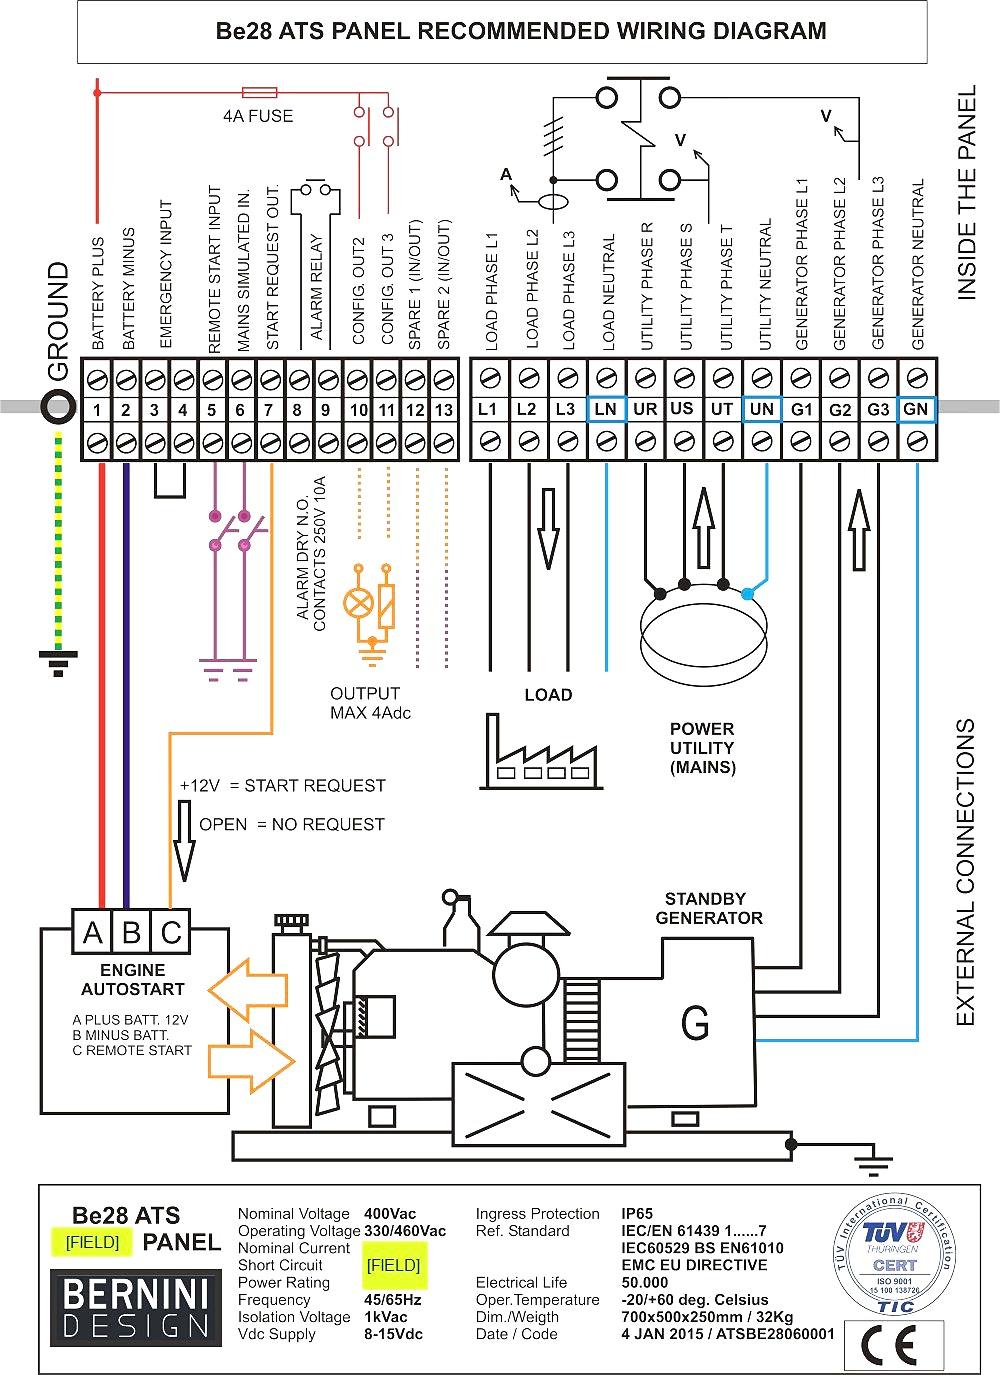 generac 200 amp automatic transfer switch wiring diagram generac generator wiring diagram 11h generac 200 amp automatic transfer switch wiring diagram gallery